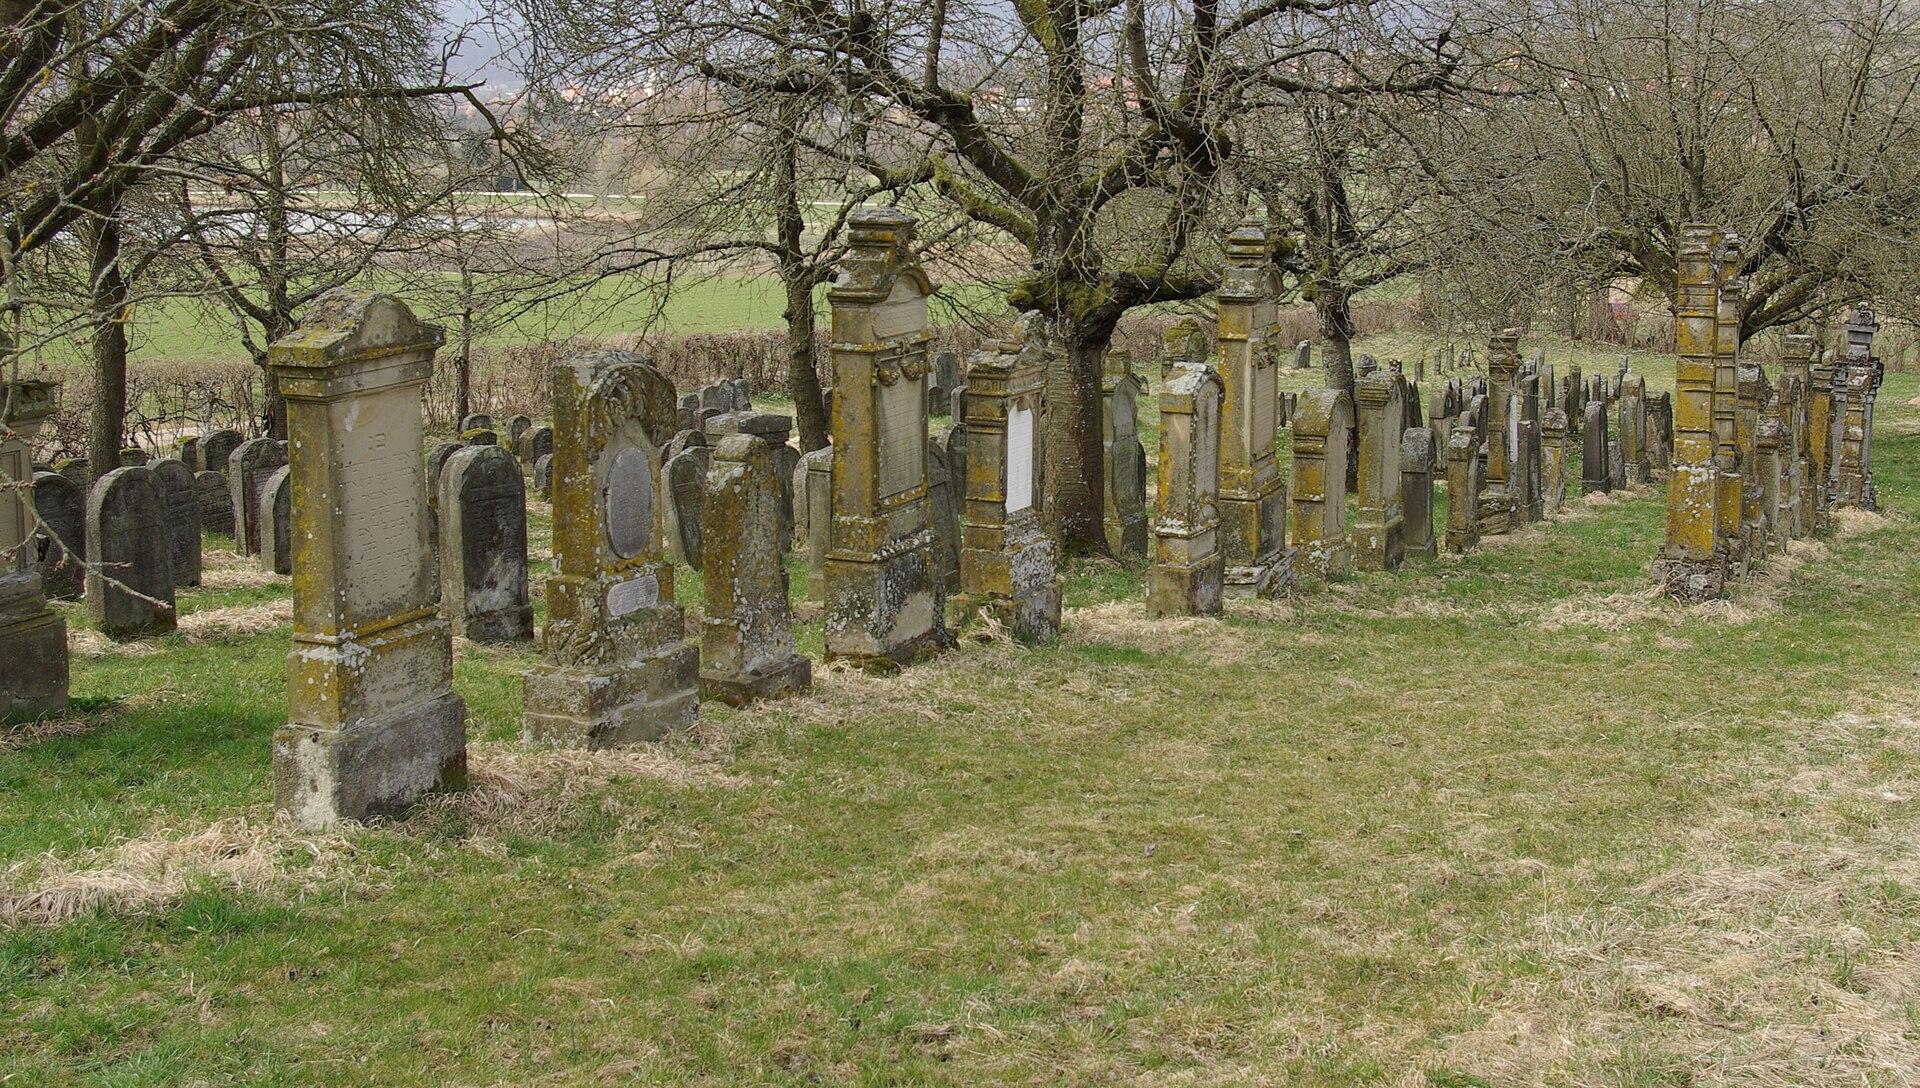 Pretzfeld Jüdischer Friedhof Hagenbach 008.JPG